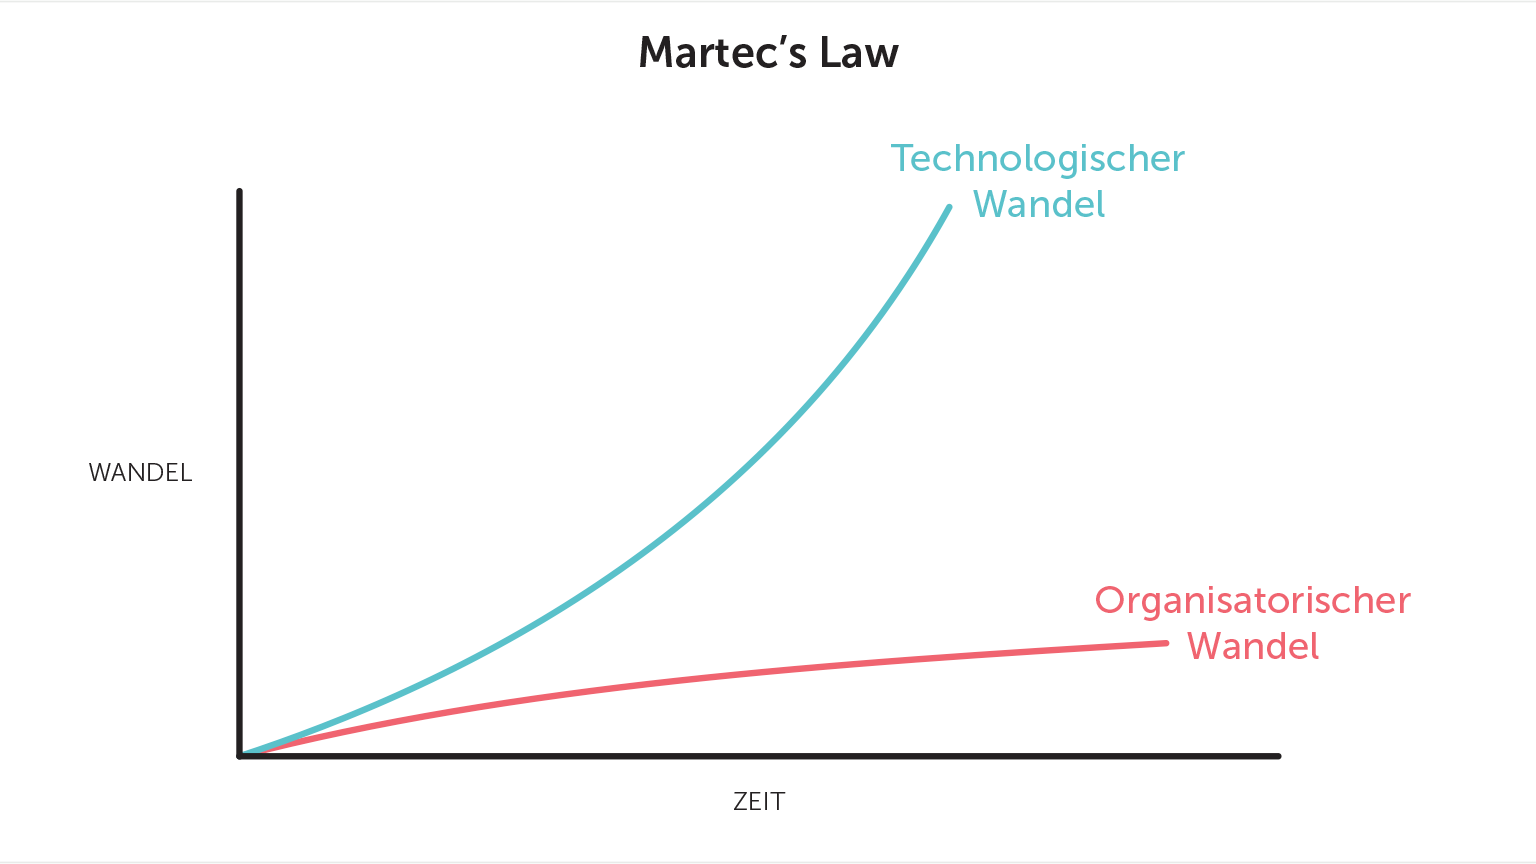 Martec's Law graphic